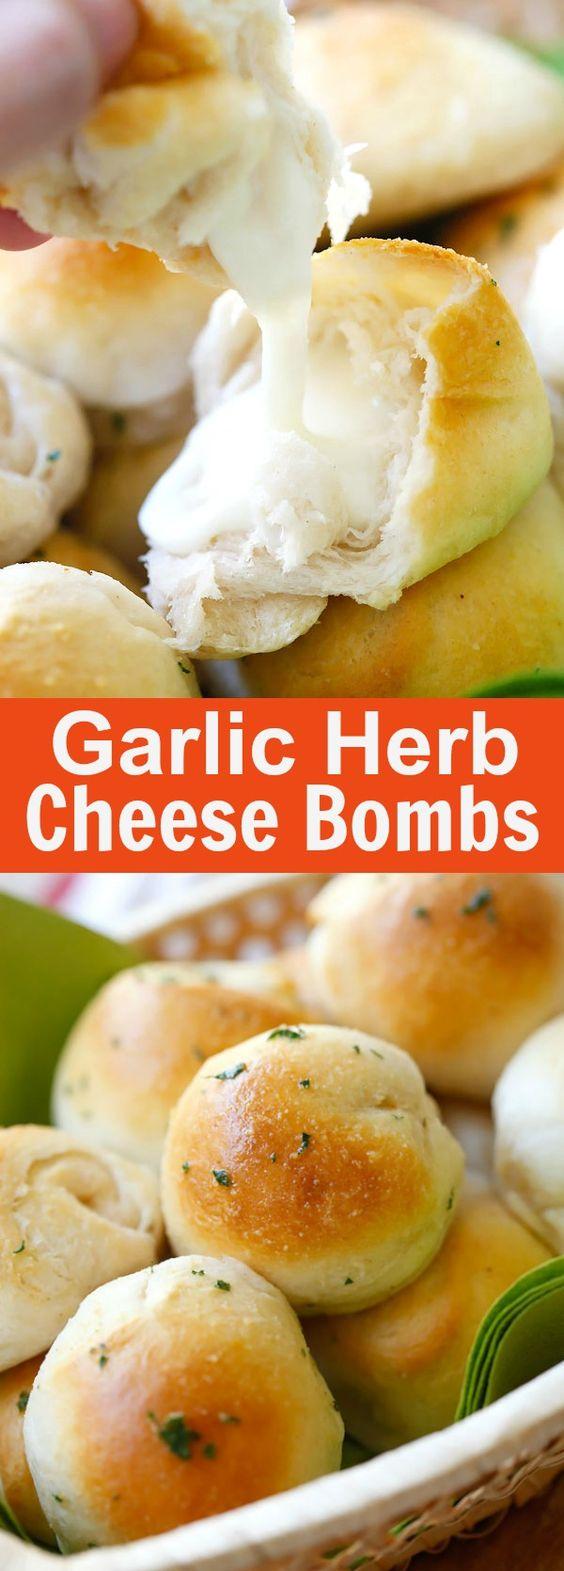 Garlic Herb Cheese Bombs